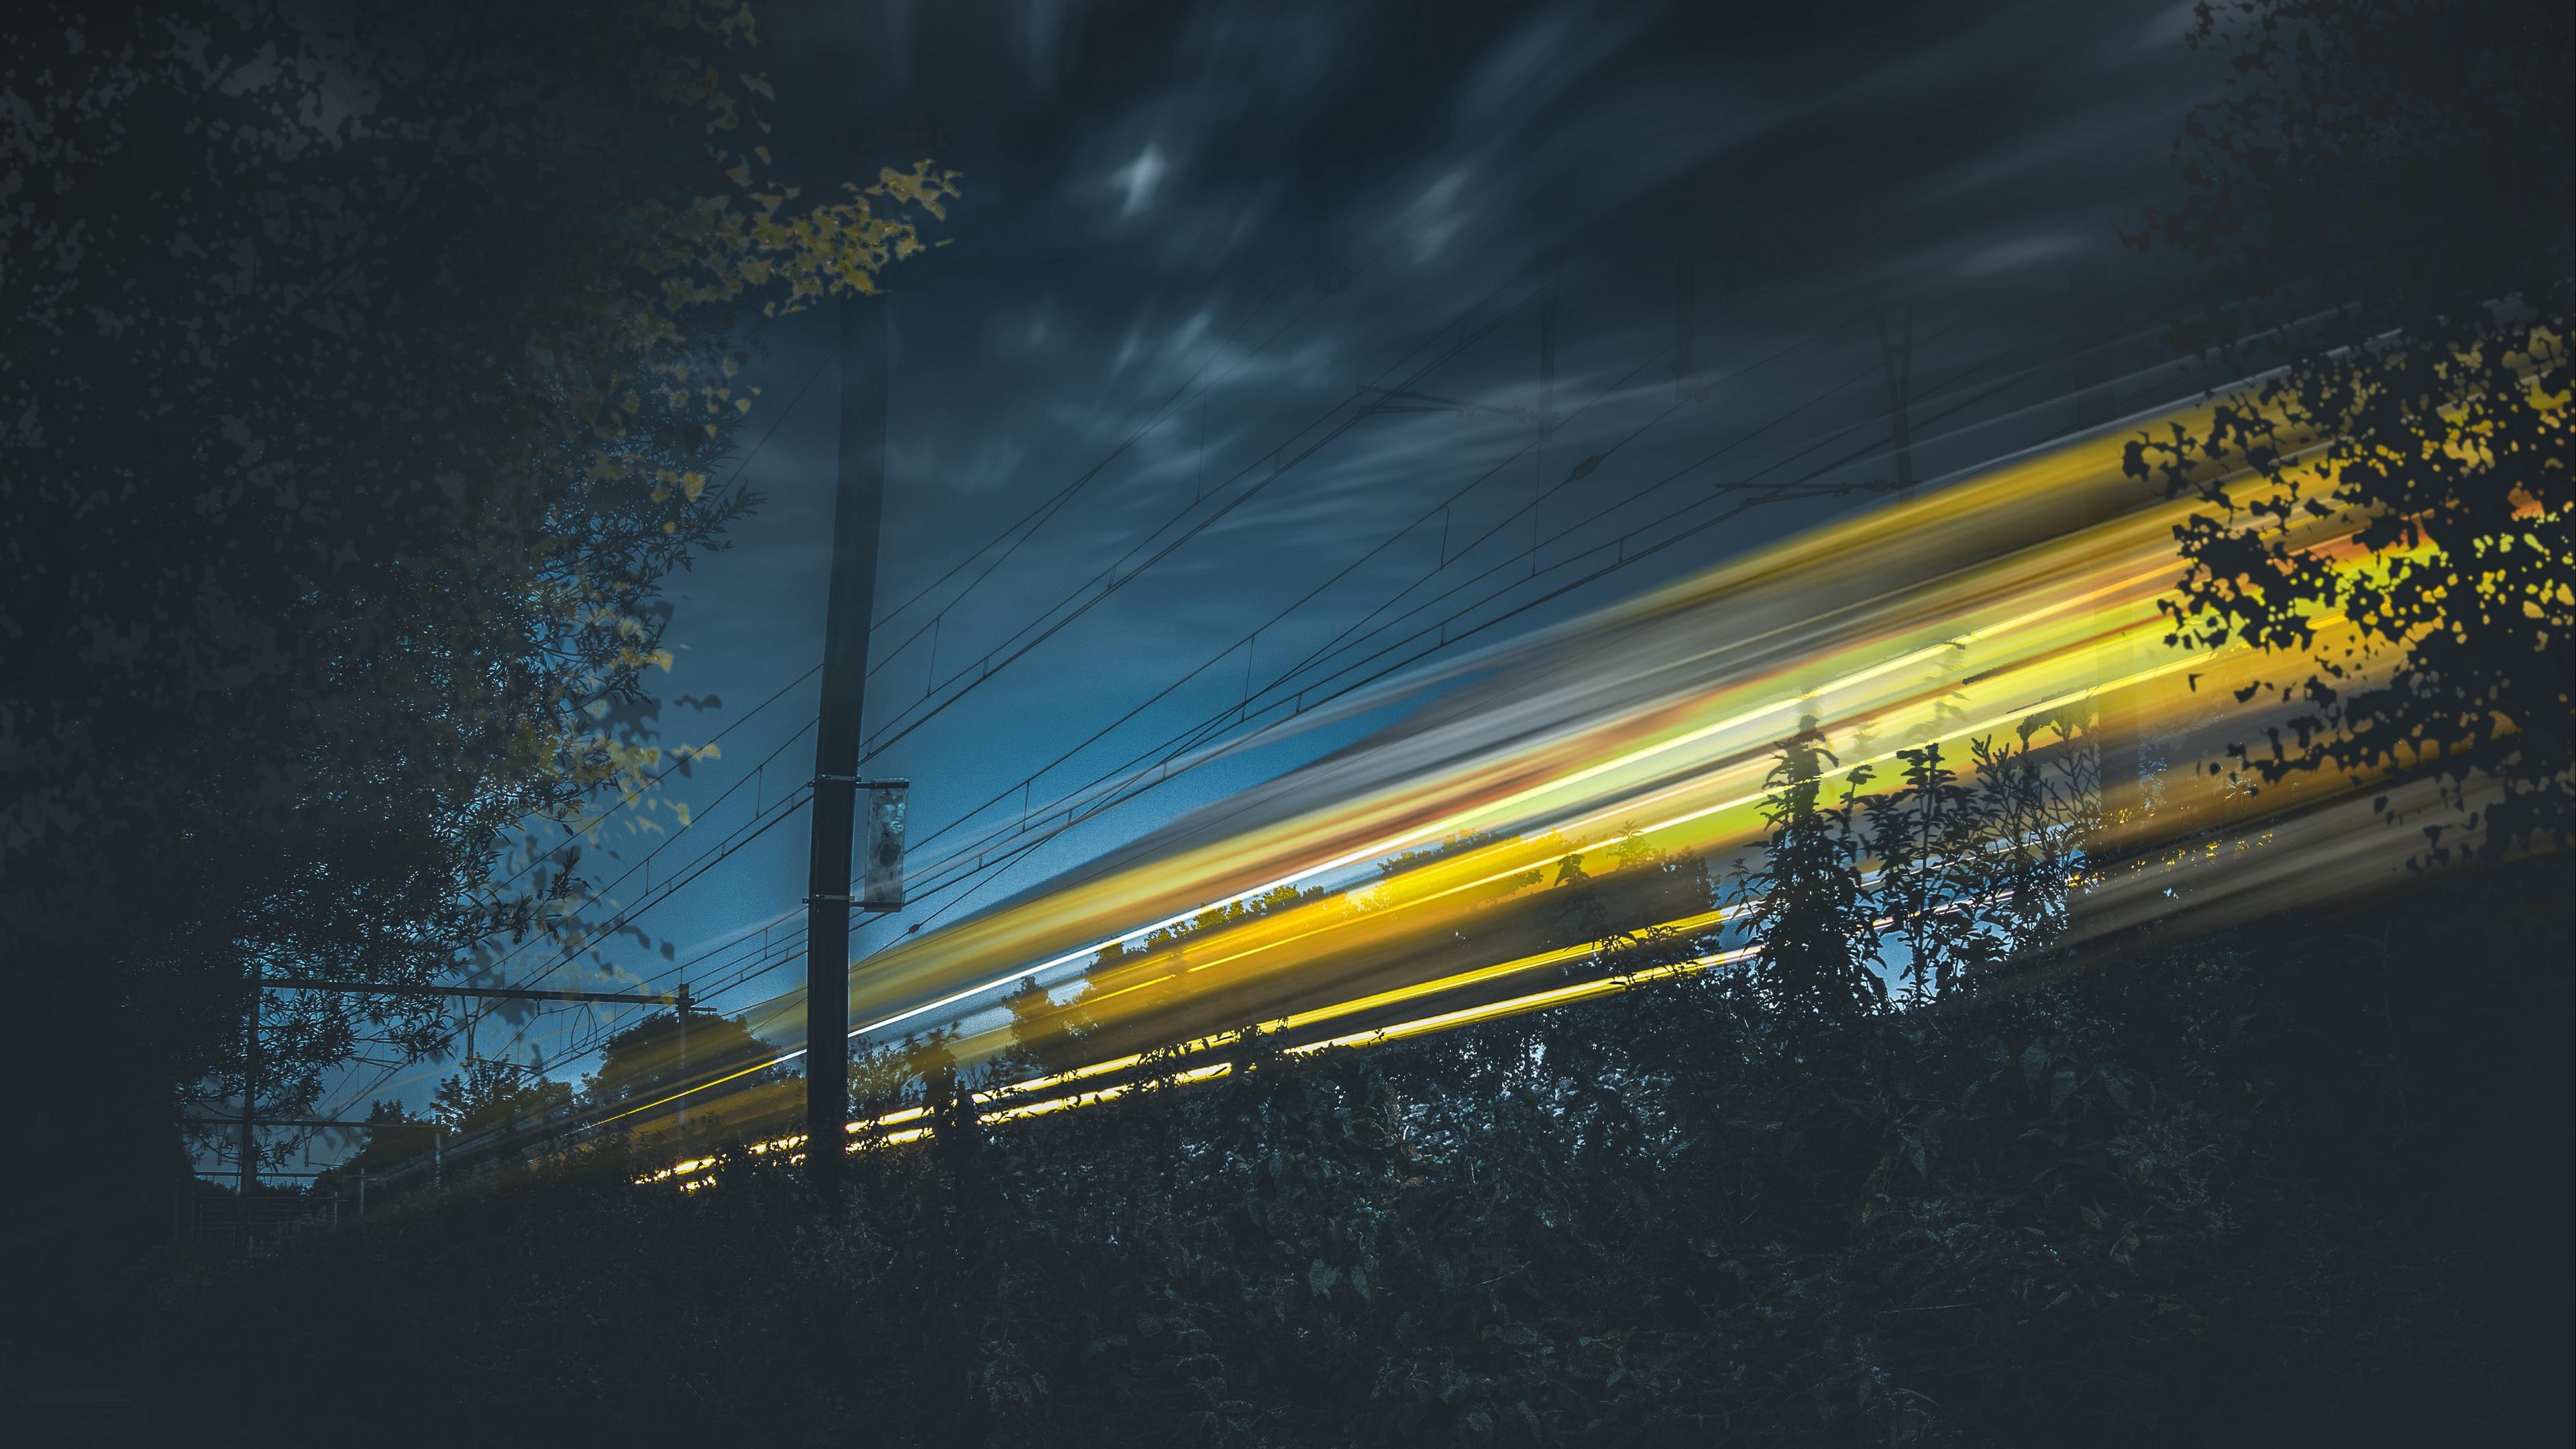 sky light railway night 4k 1540575278 - sky, light, railway, night 4k - Sky, railway, Light